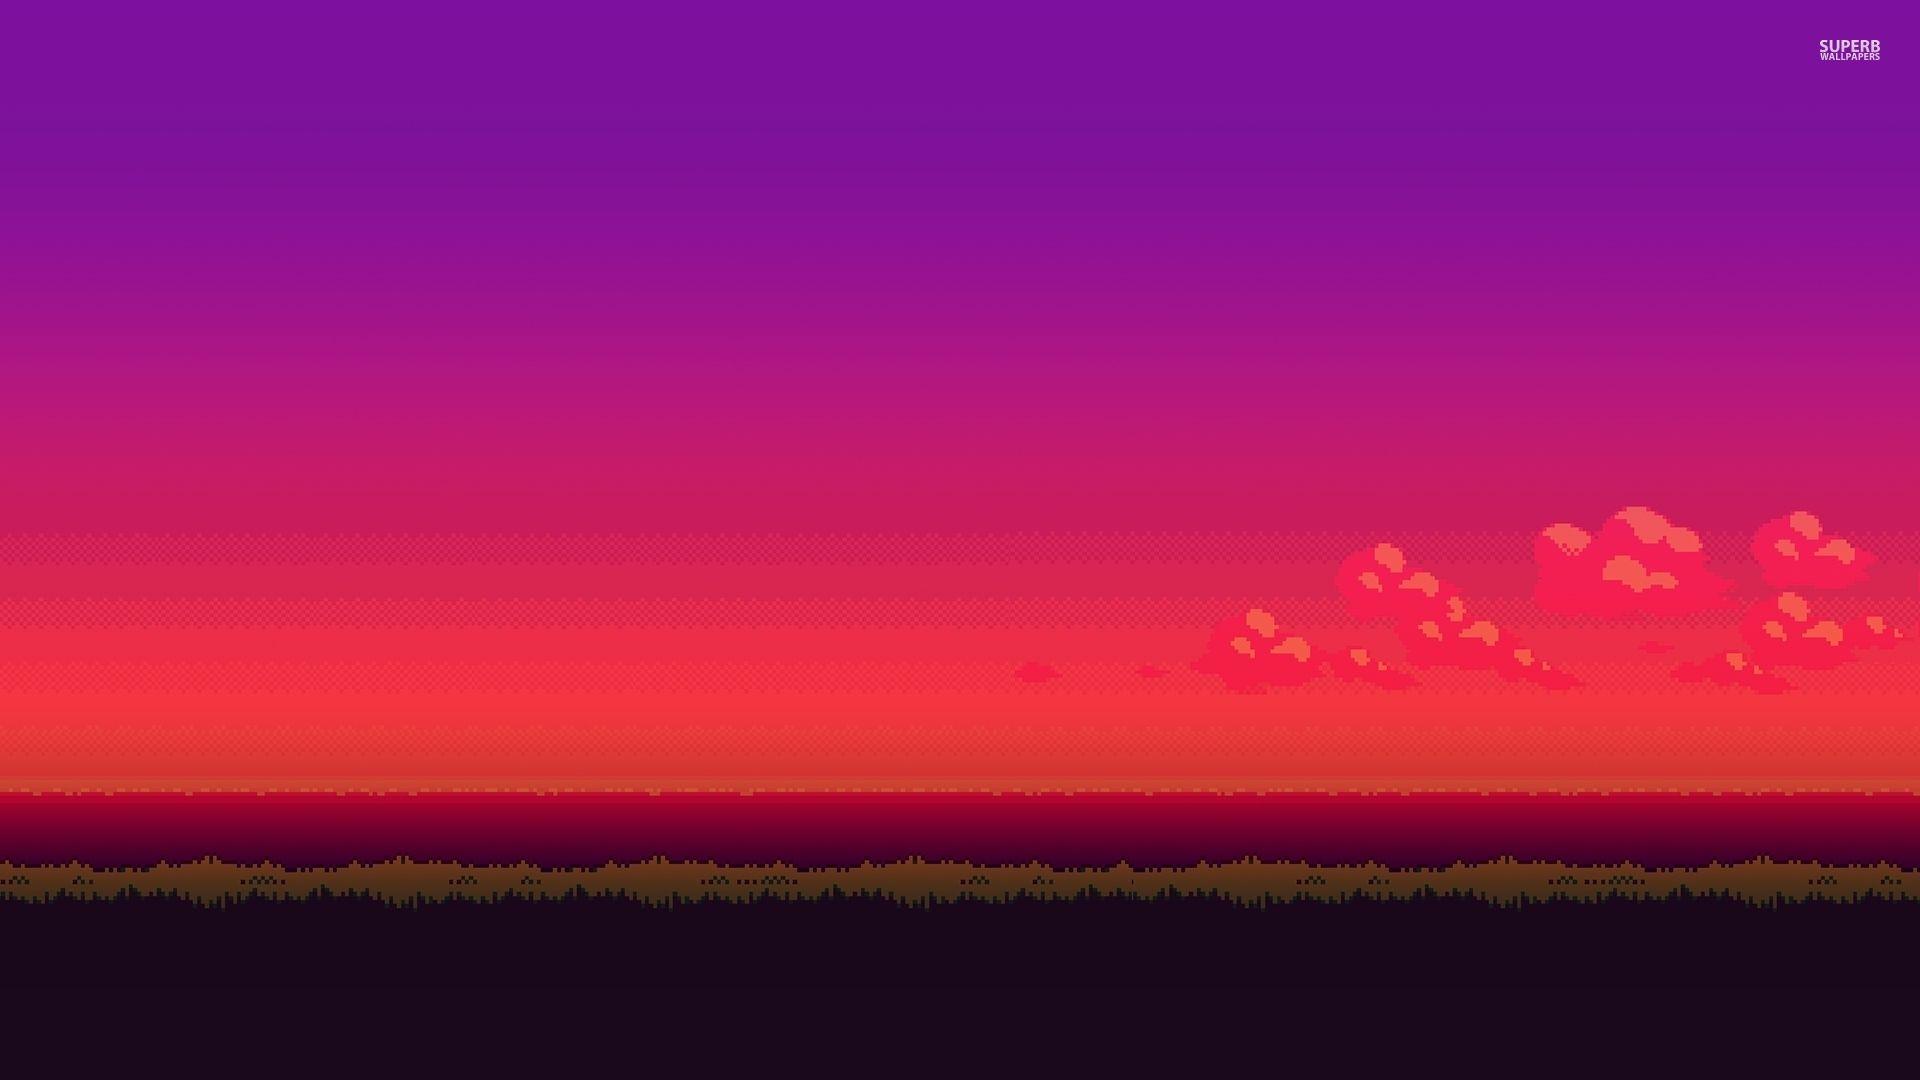 free wallpaper pixel